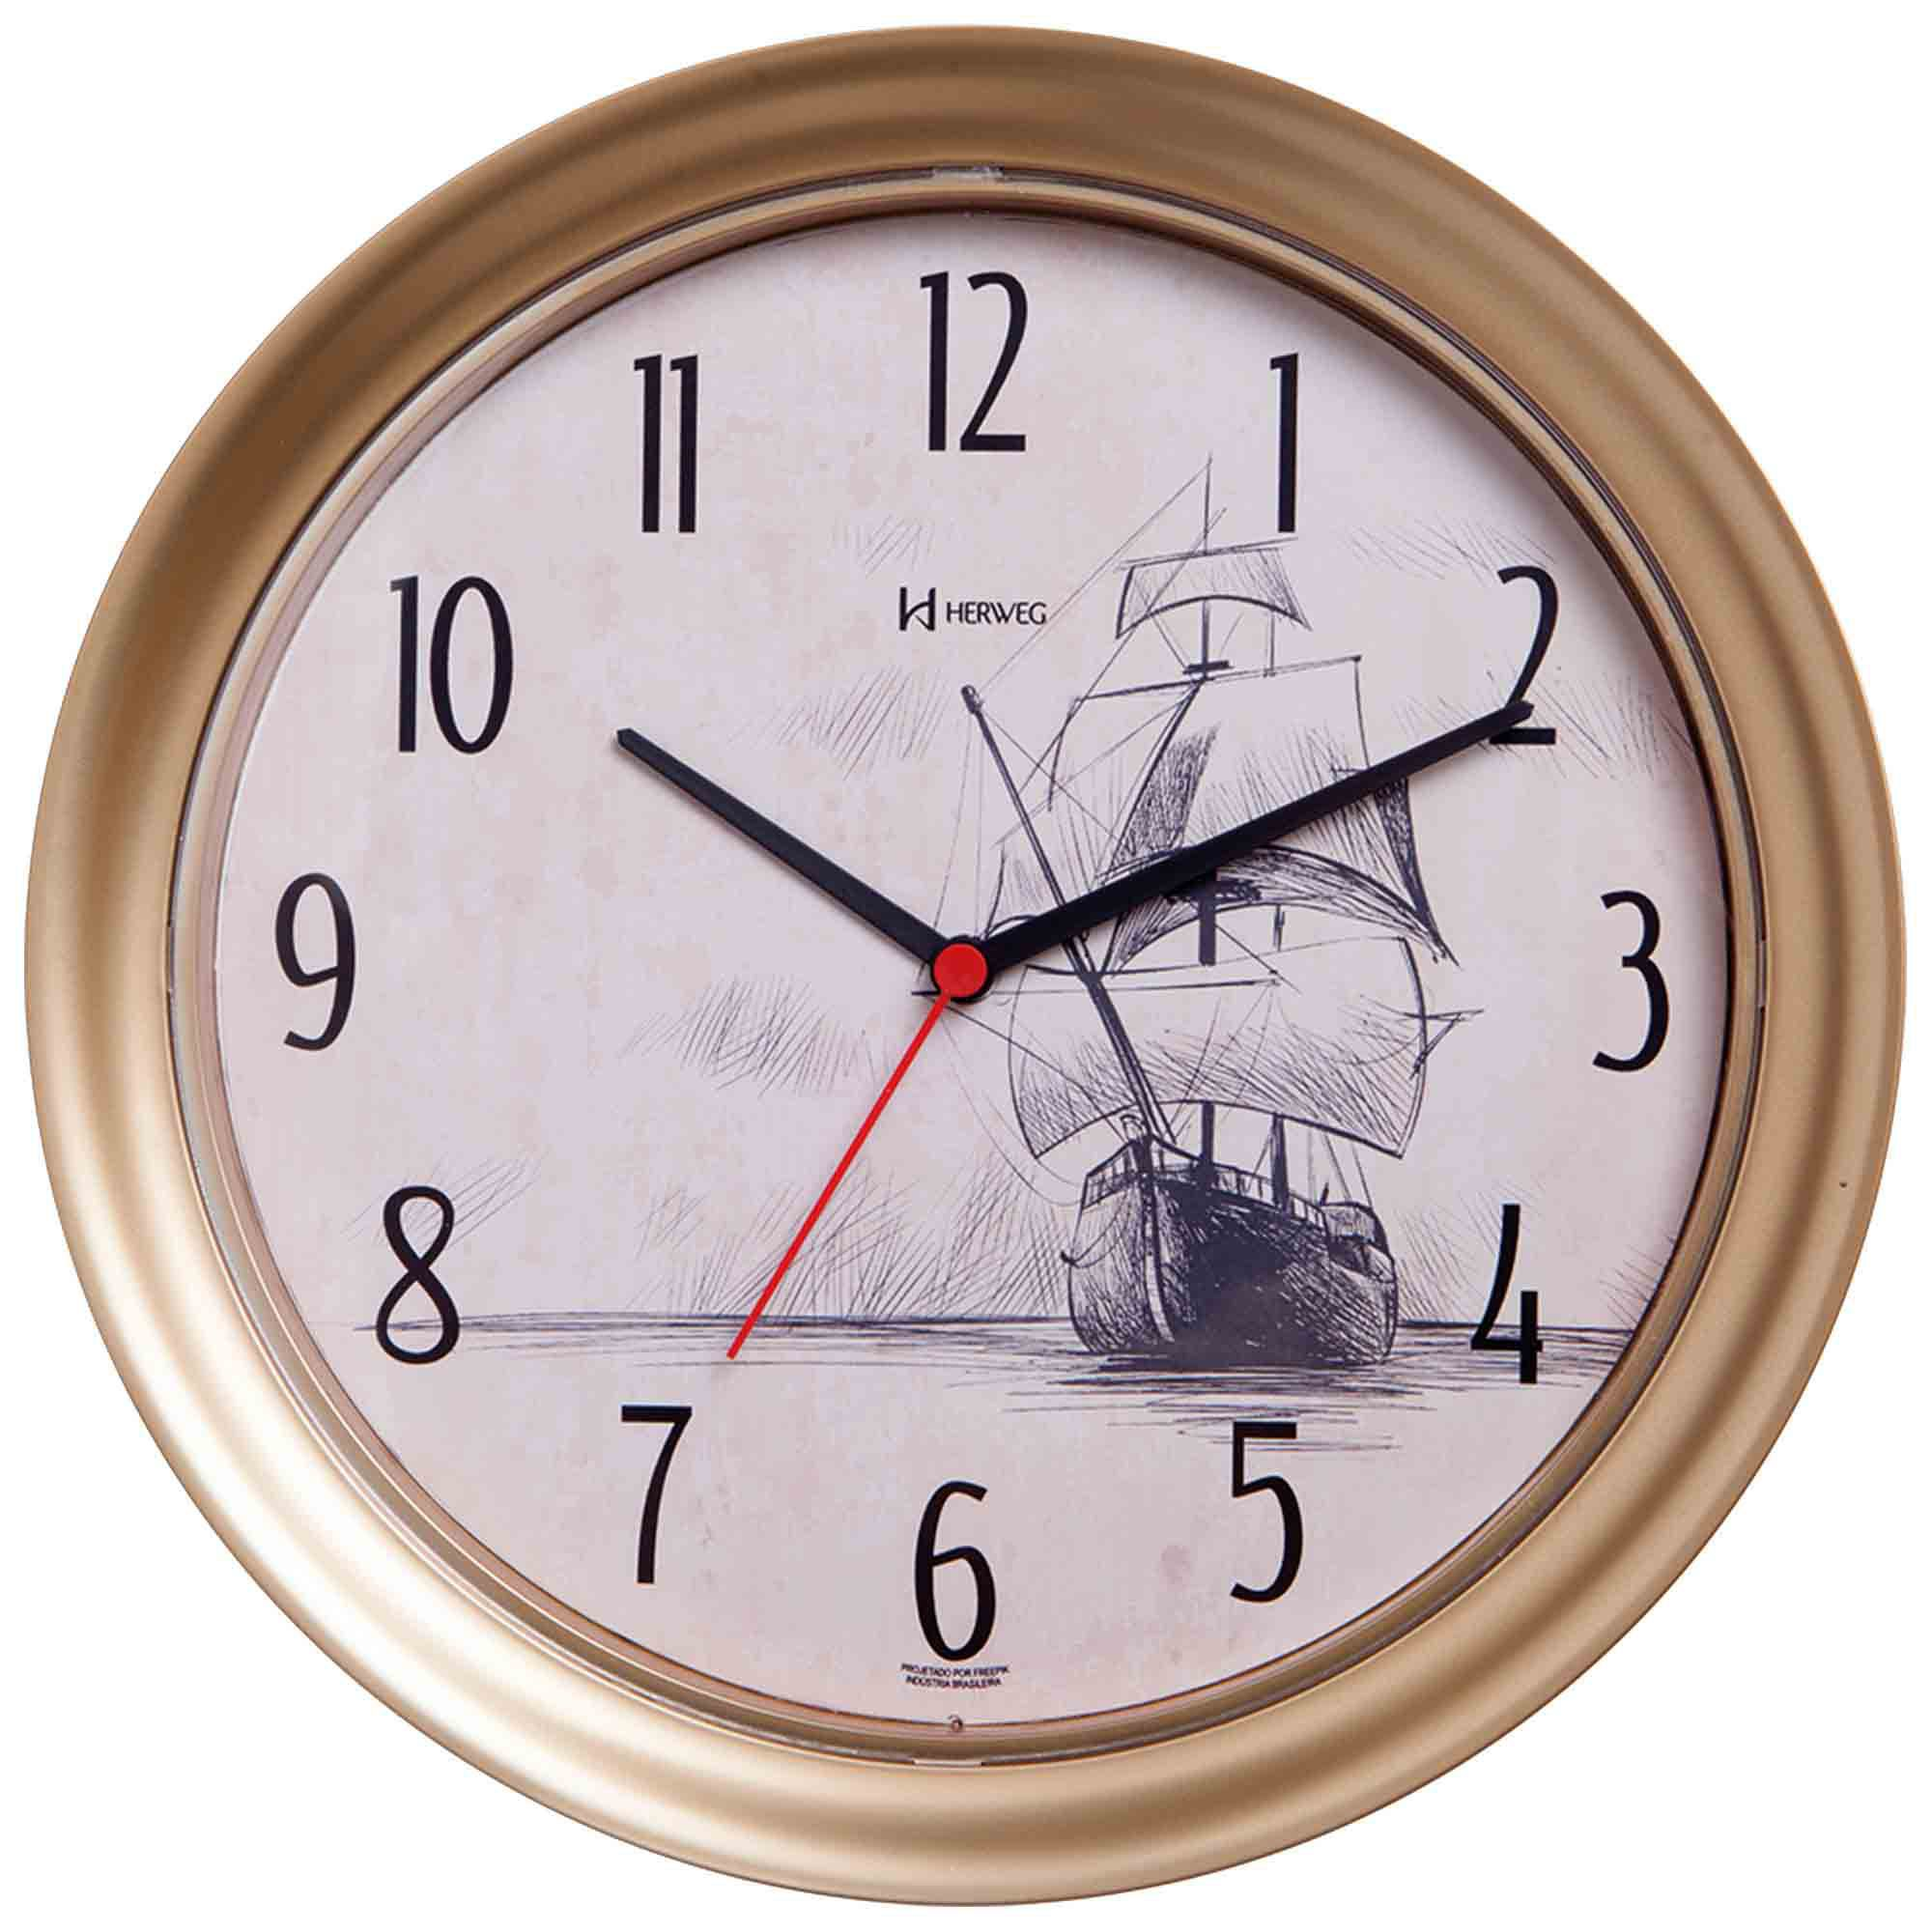 Relógio de Parede Analógico Herweg 660033 318 Dourado Fosco